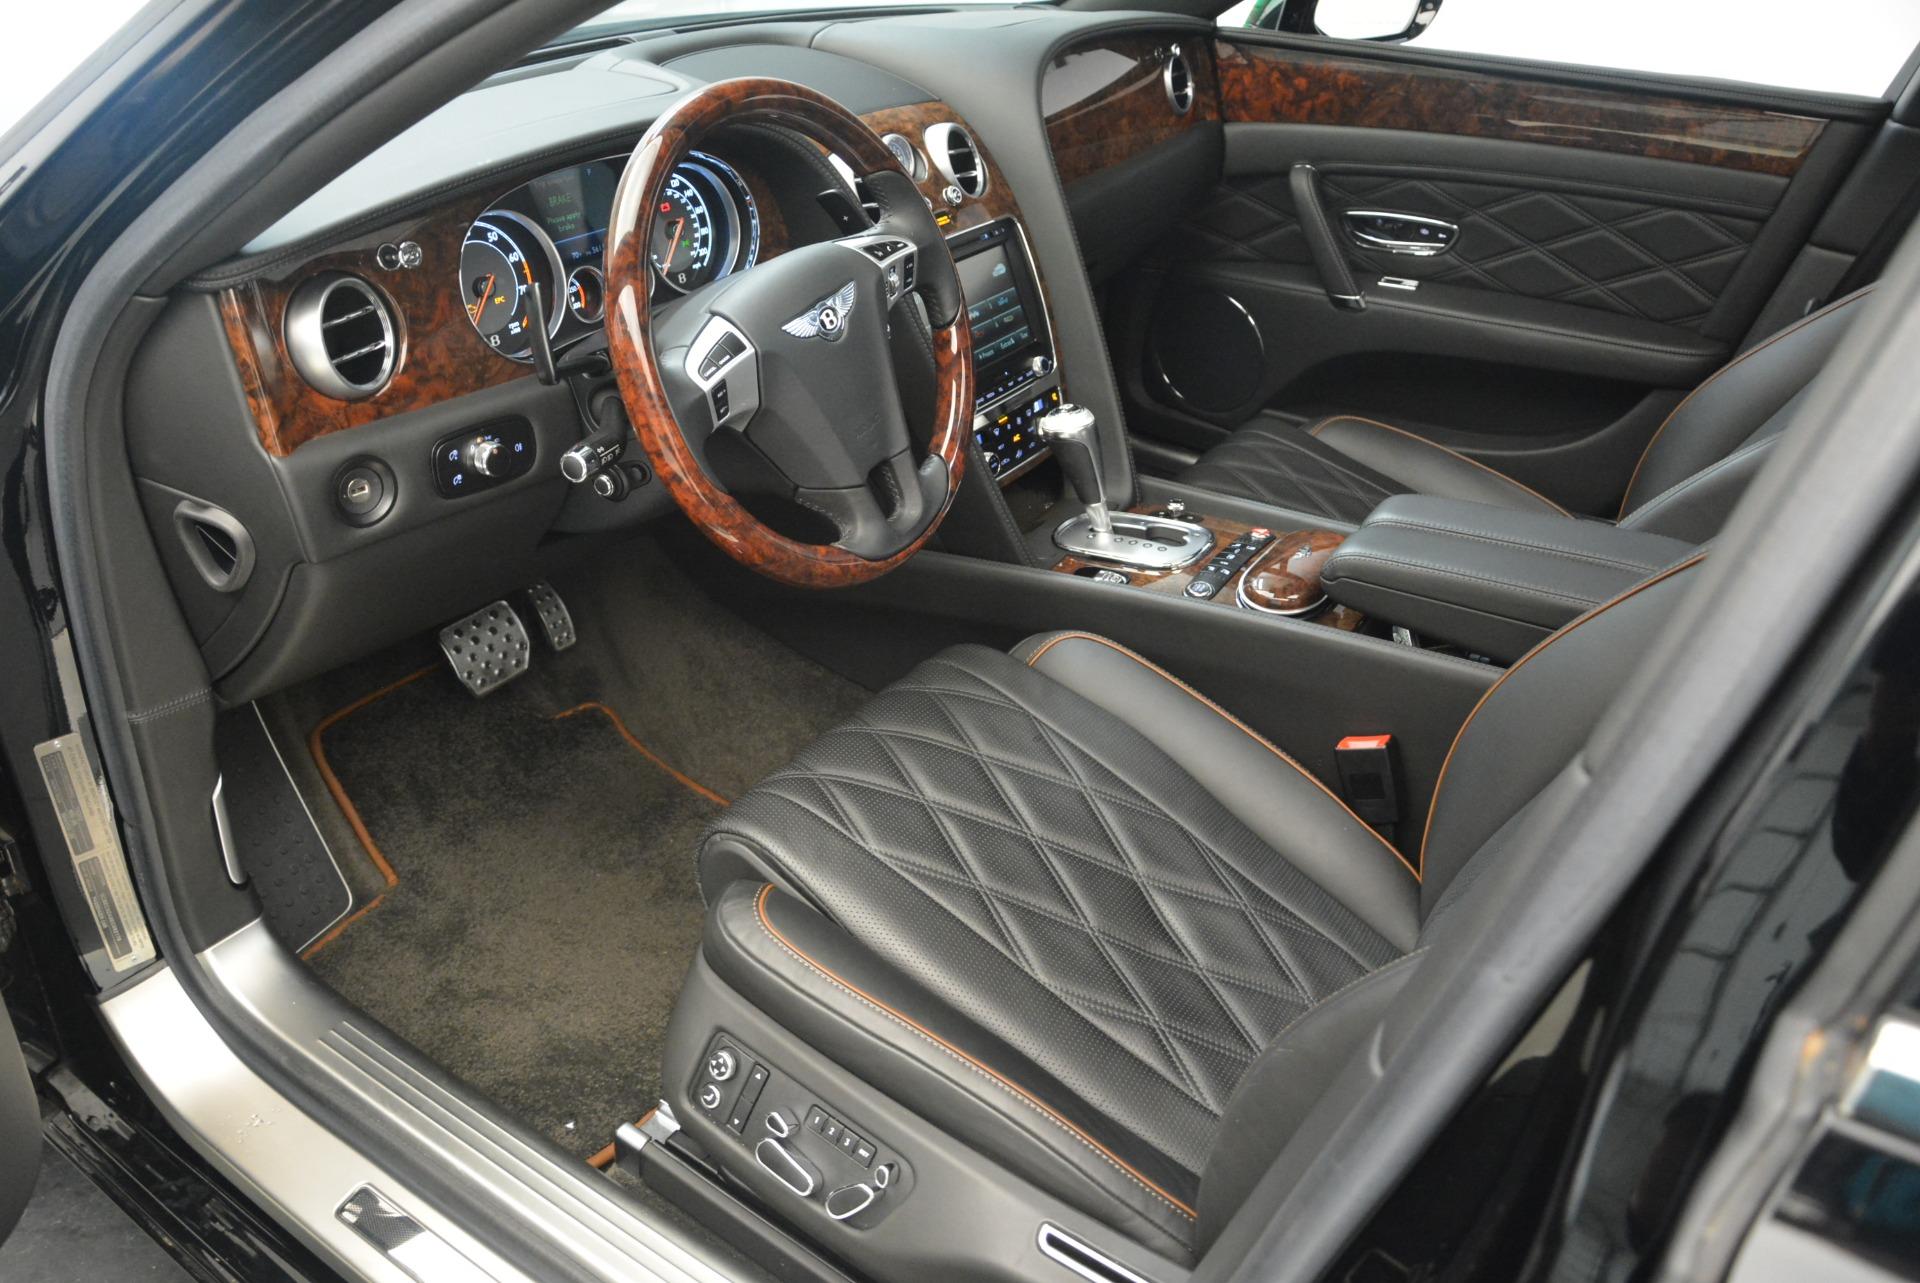 Used 2014 Bentley Flying Spur W12 For Sale In Westport, CT 2267_p17